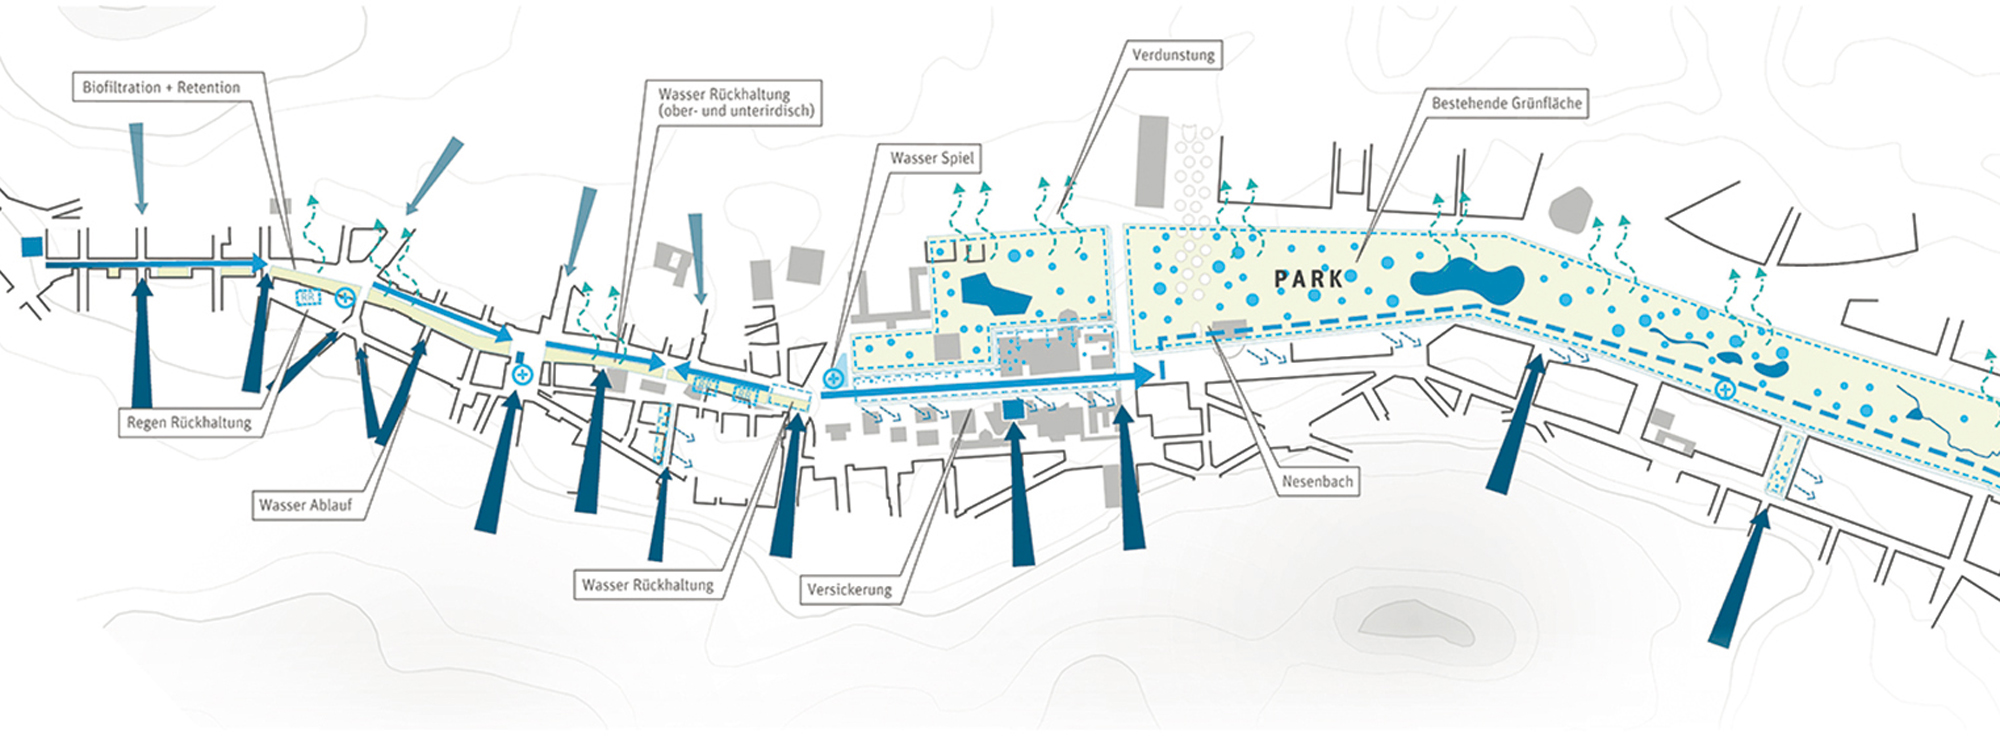 Stuttgart_Wettbewerb_B14_Freiraum_Verkehrsachse_Transformation_ppas